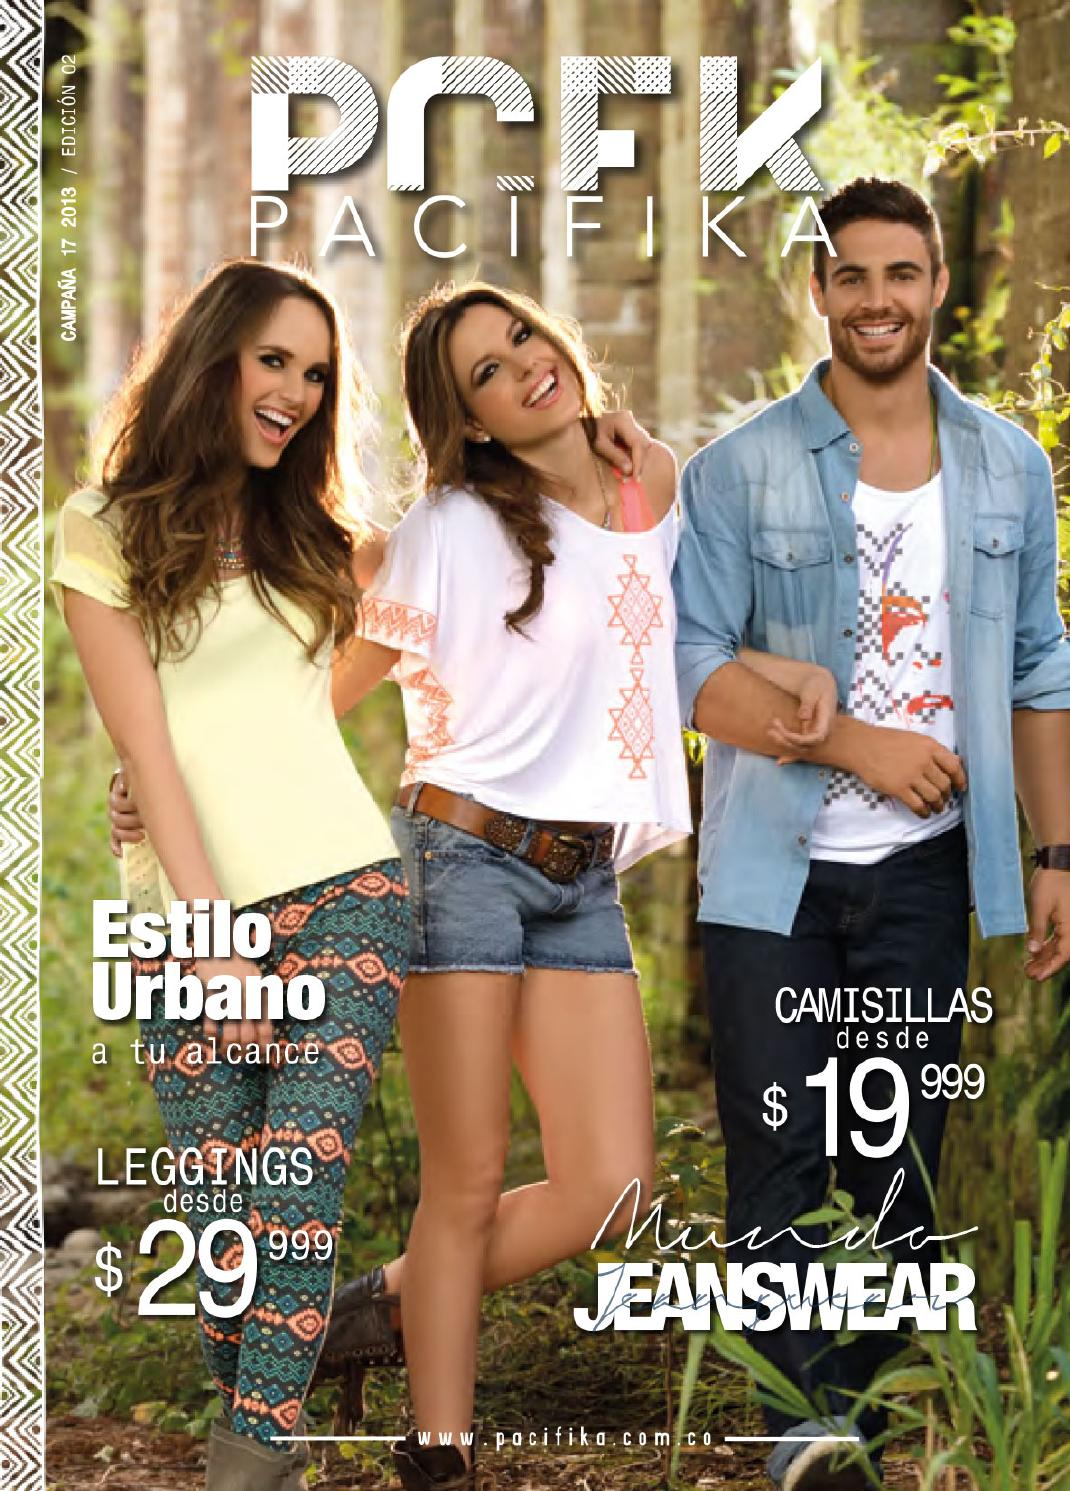 794a4cc81 Catálogo Pacífika campaña 17 de 2013 by PCFKPacifika - issuu